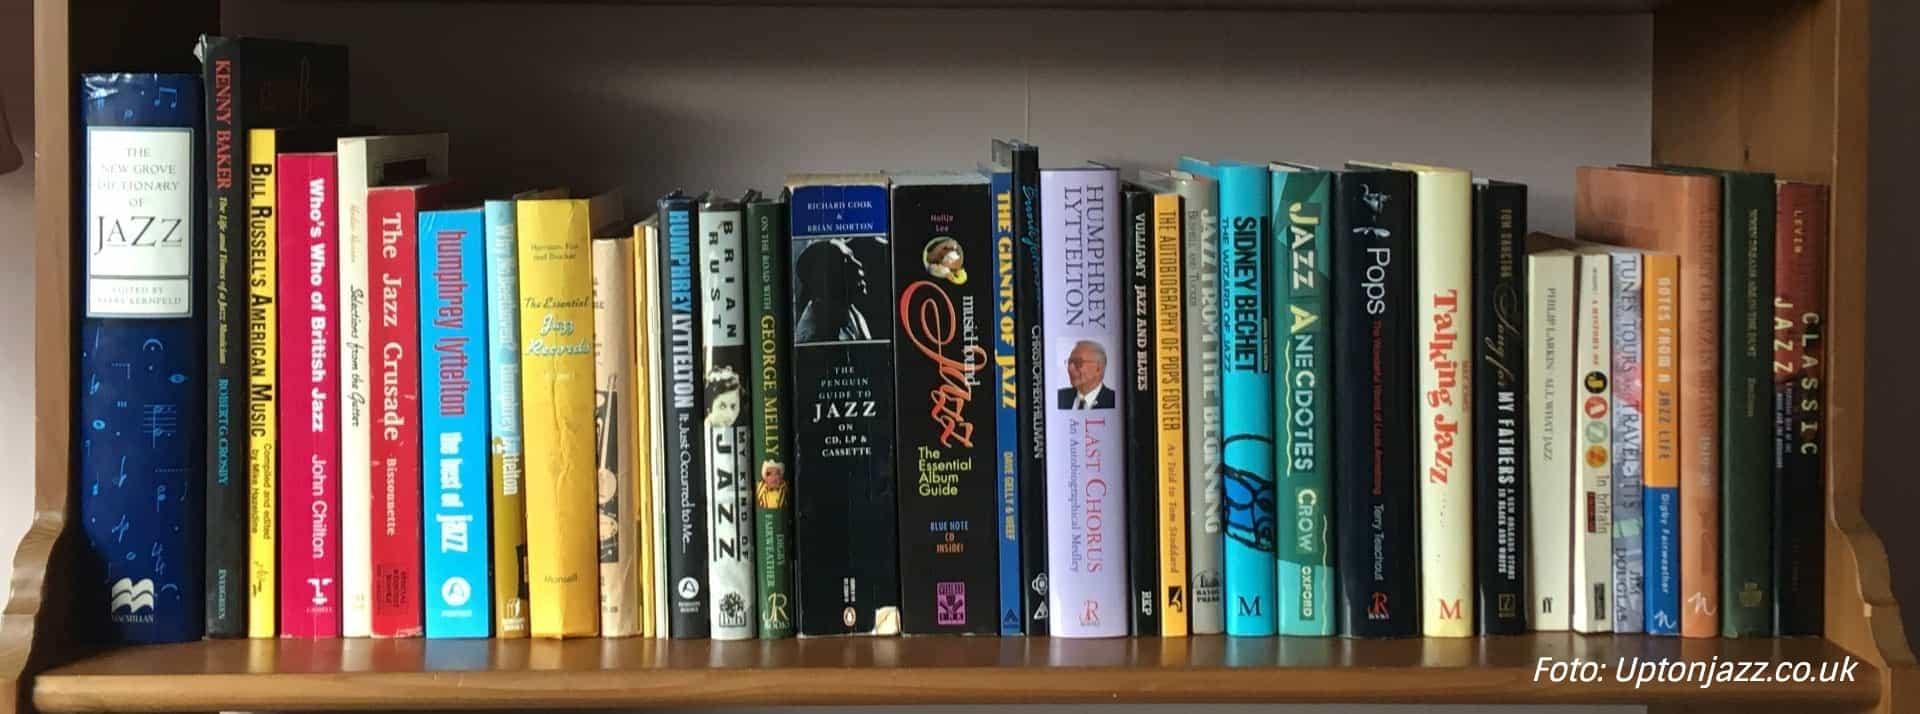 8 Boeken over Jazz Muziek | Fresh Jazz Agency